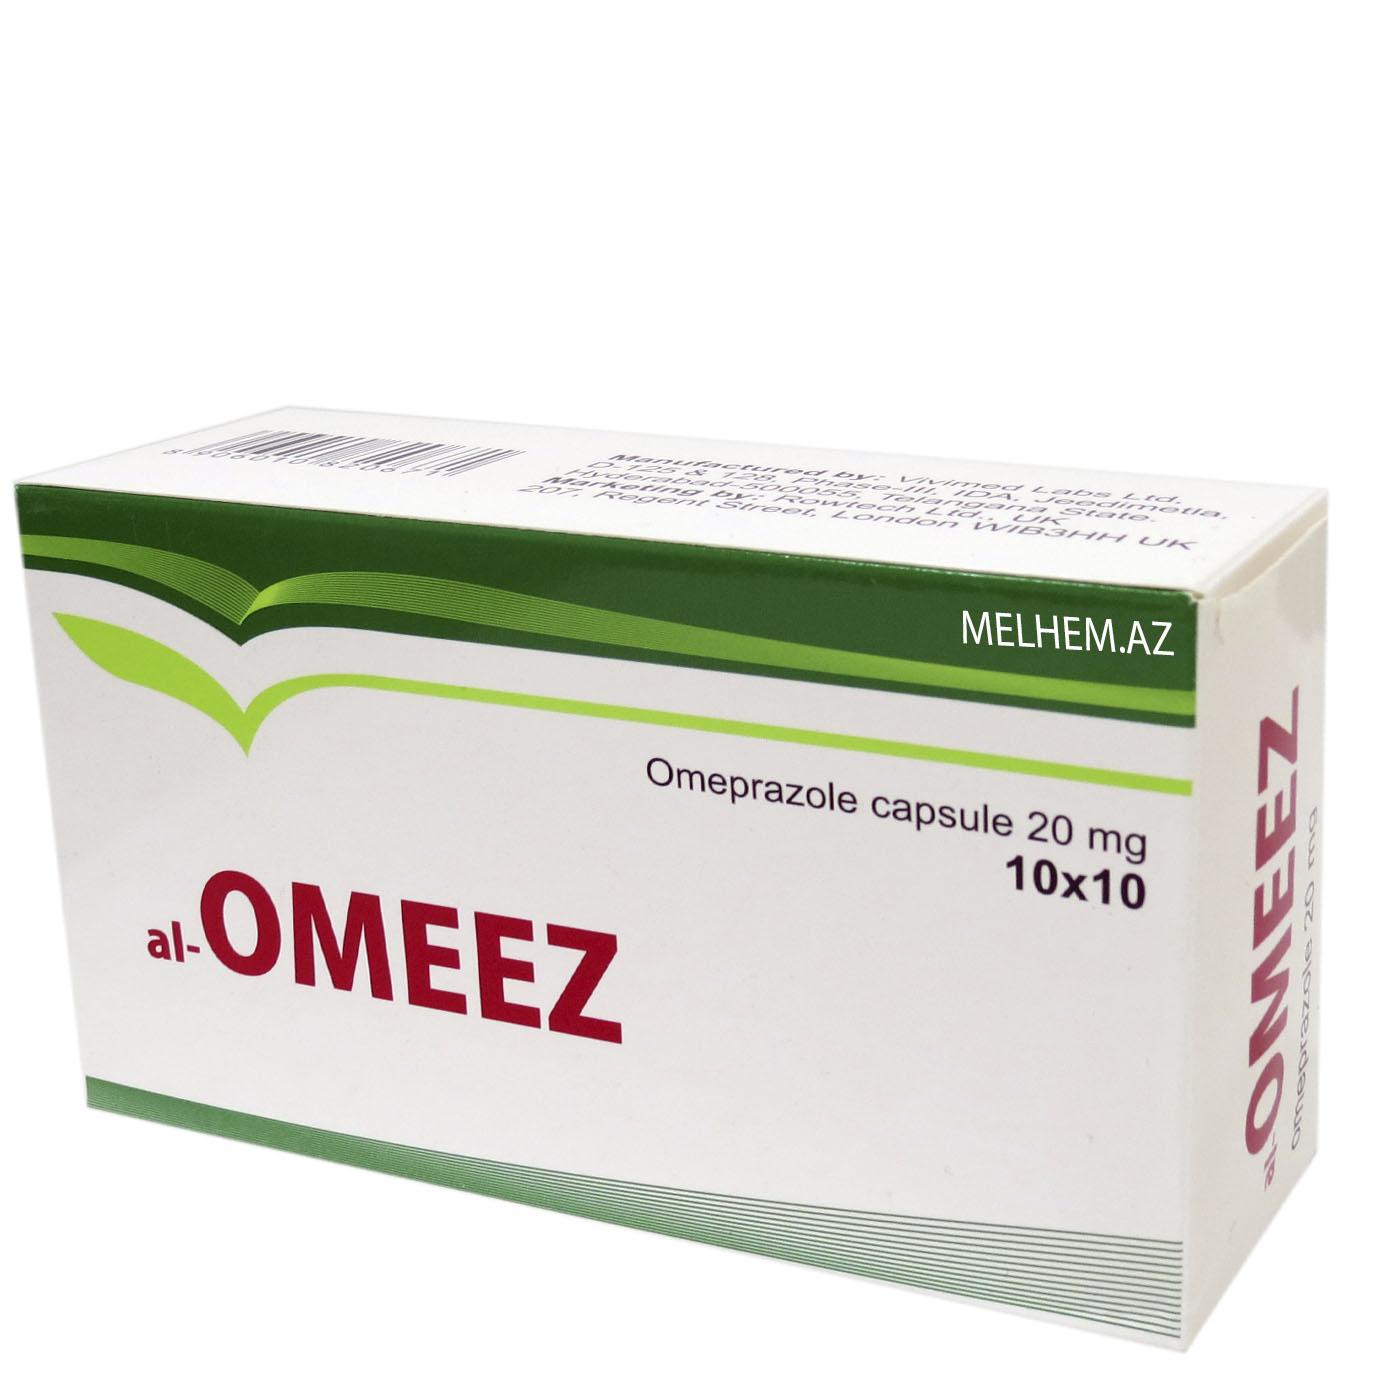 OMEEZ 20 MG N10